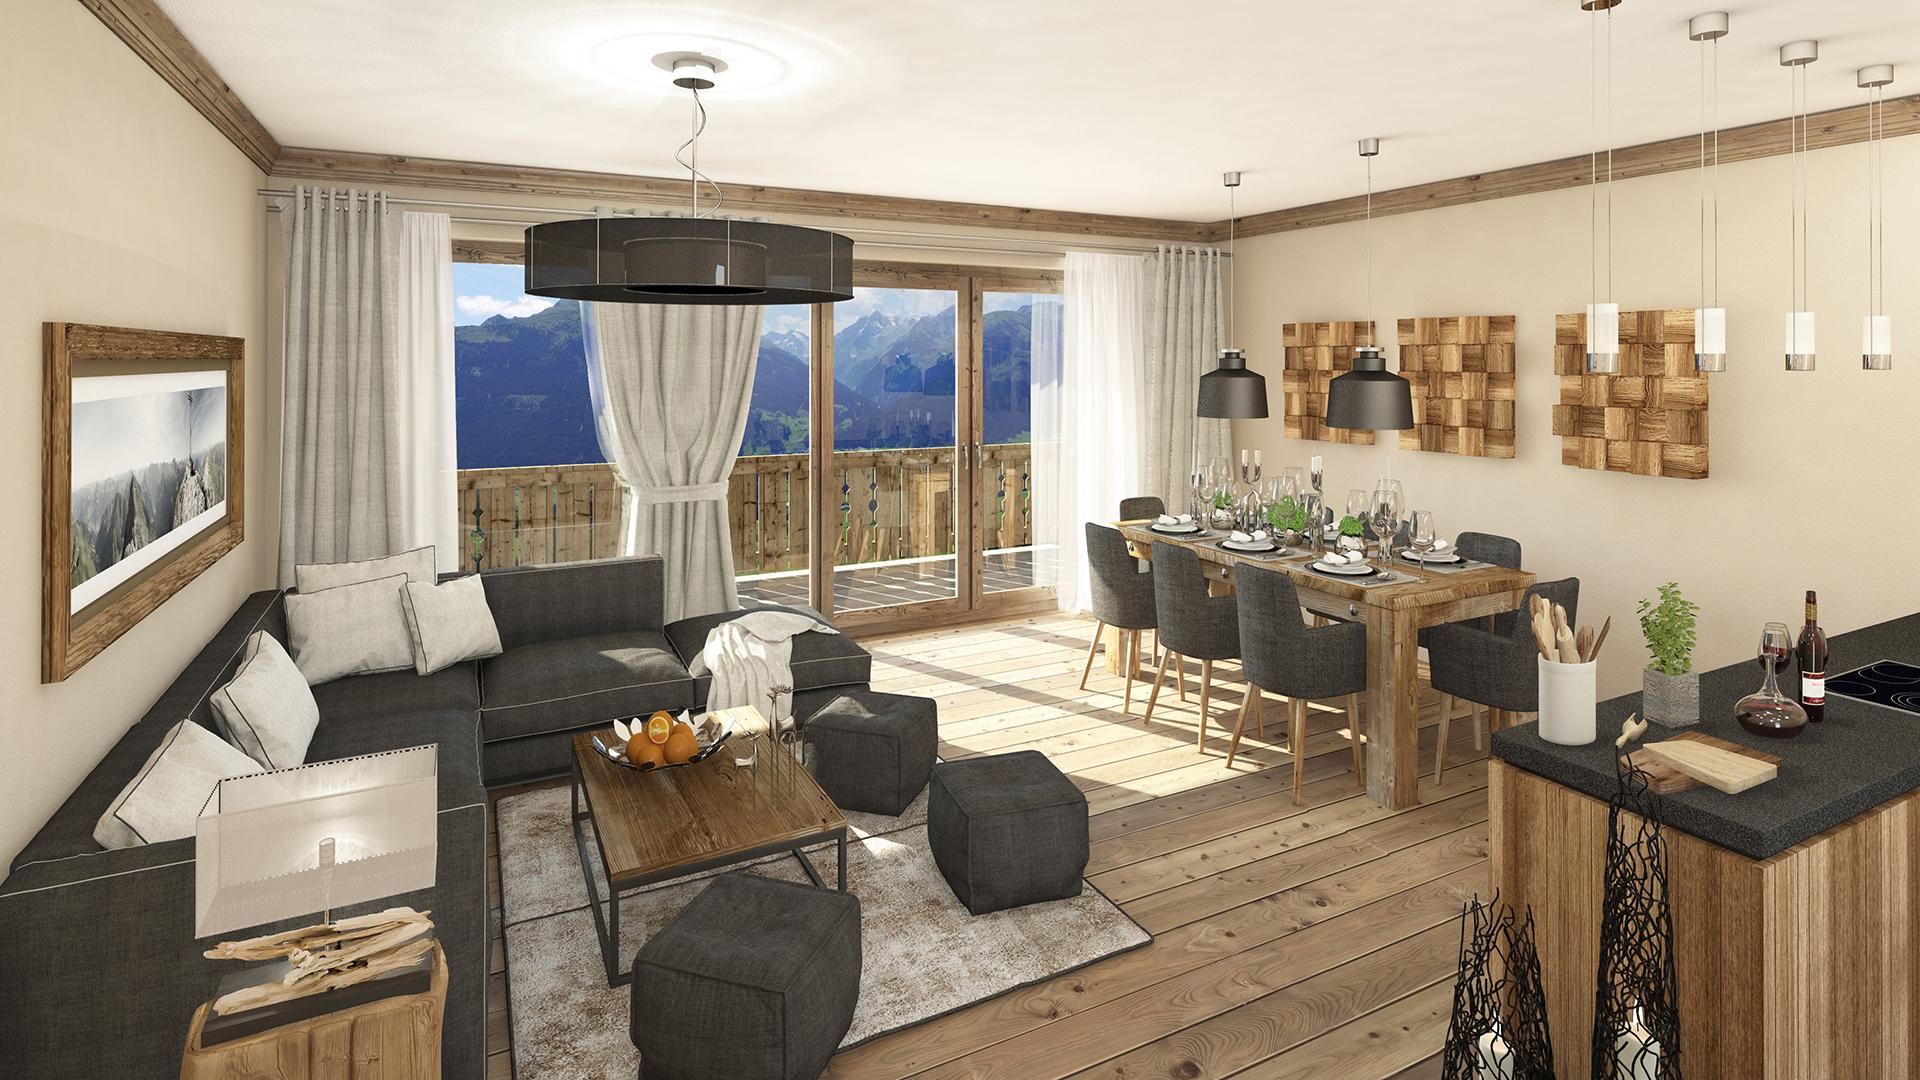 The Kaiser Lodge Apartments, Austria